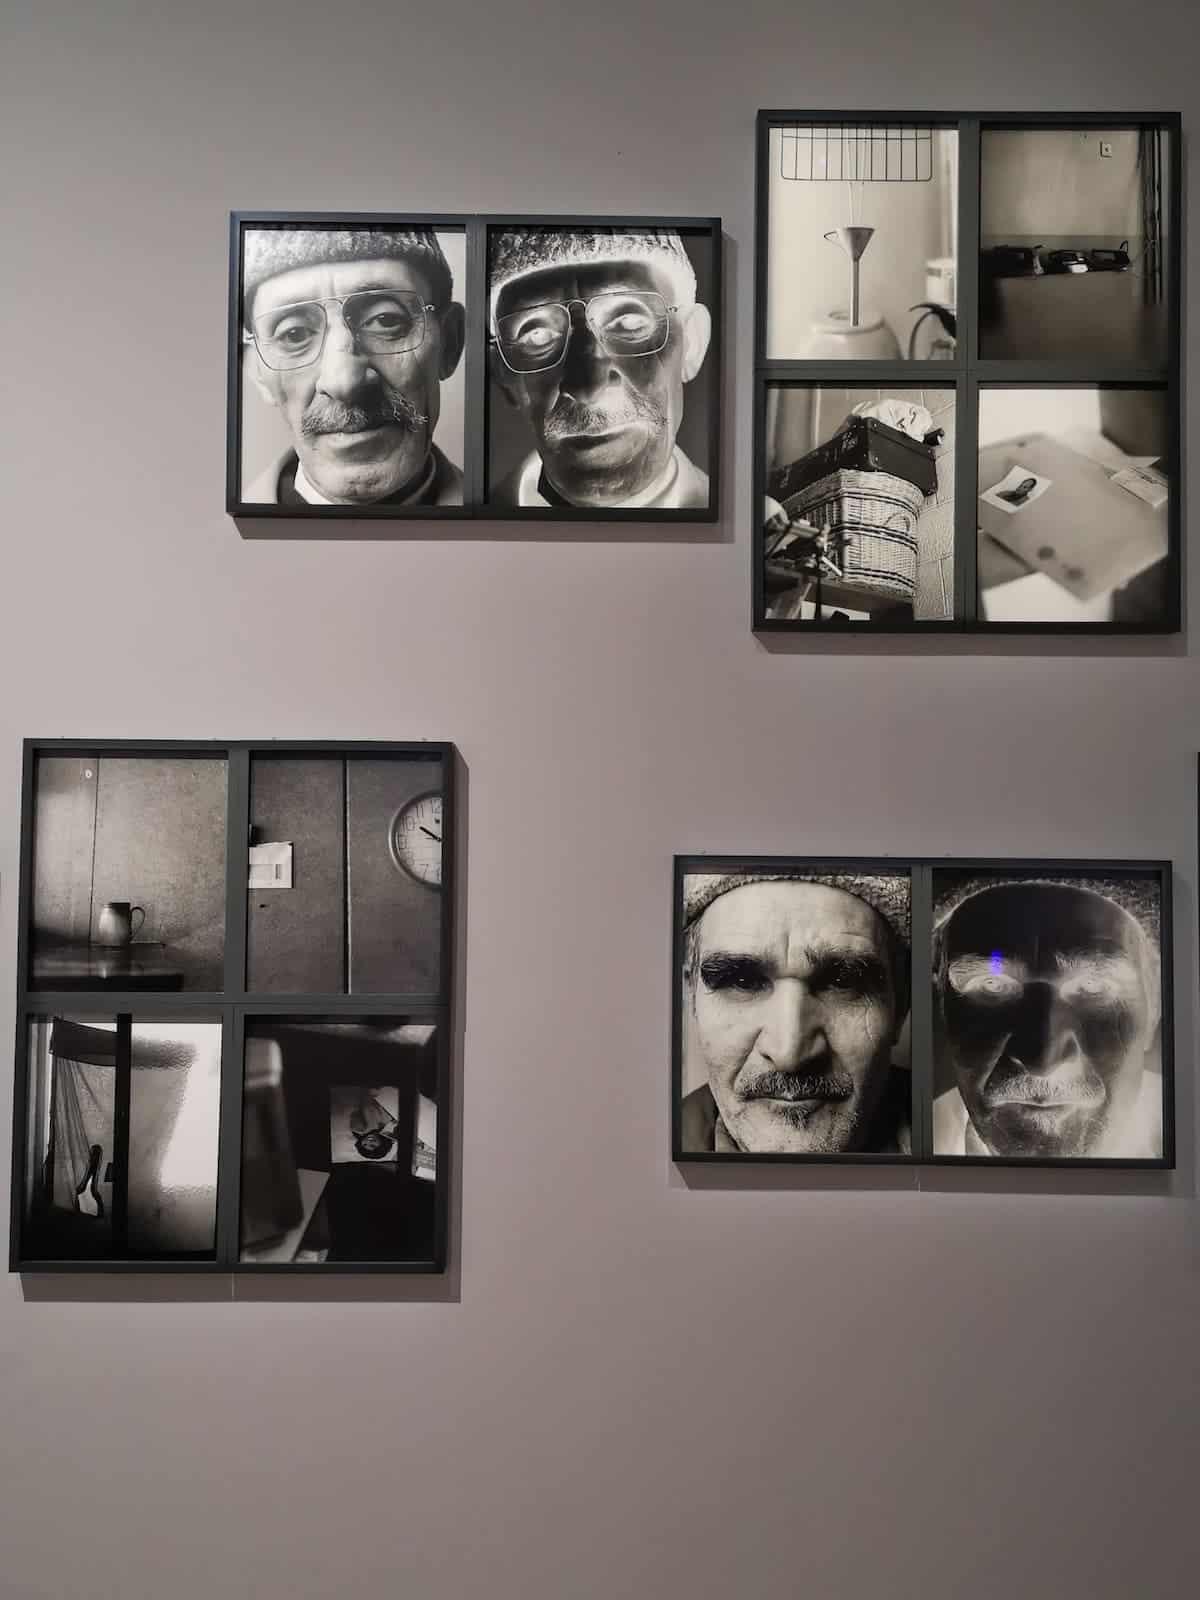 exposition-persona-grata-musee-immigration-mac-val-paris12em-vitry